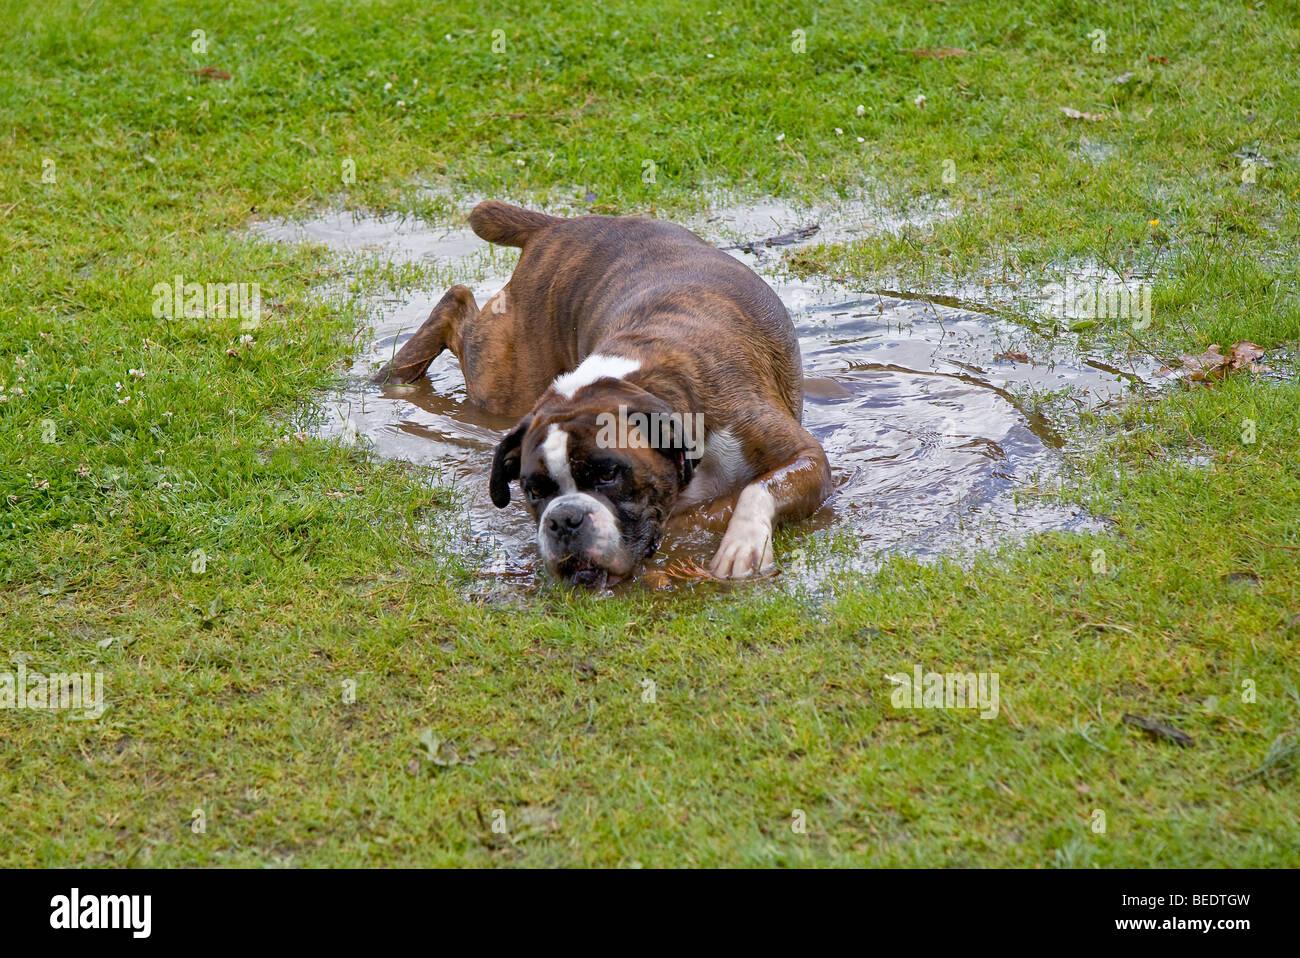 Perro Boxer rolling en charco de agua en la hierba. UK Imagen De Stock